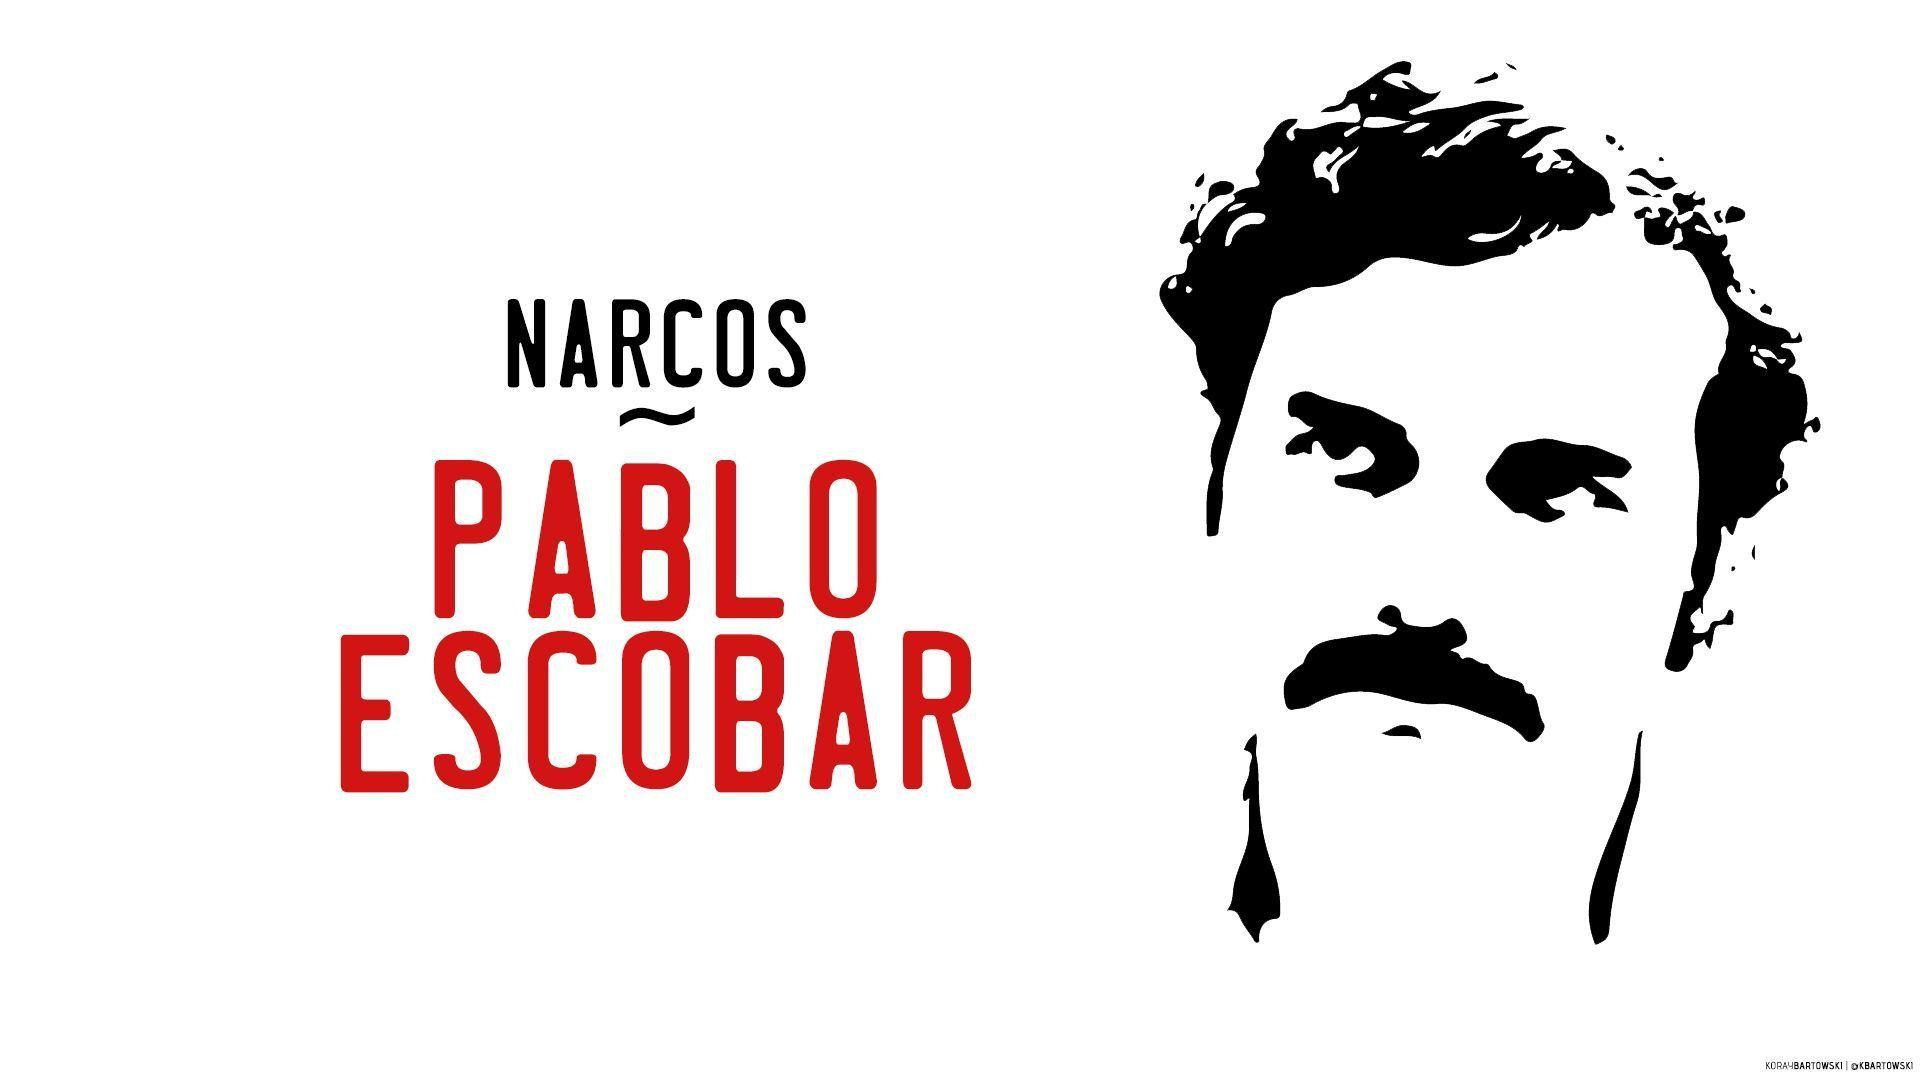 Narcos Wallpapers Hd Download Pablo Escobar Narcos Poster Escobar